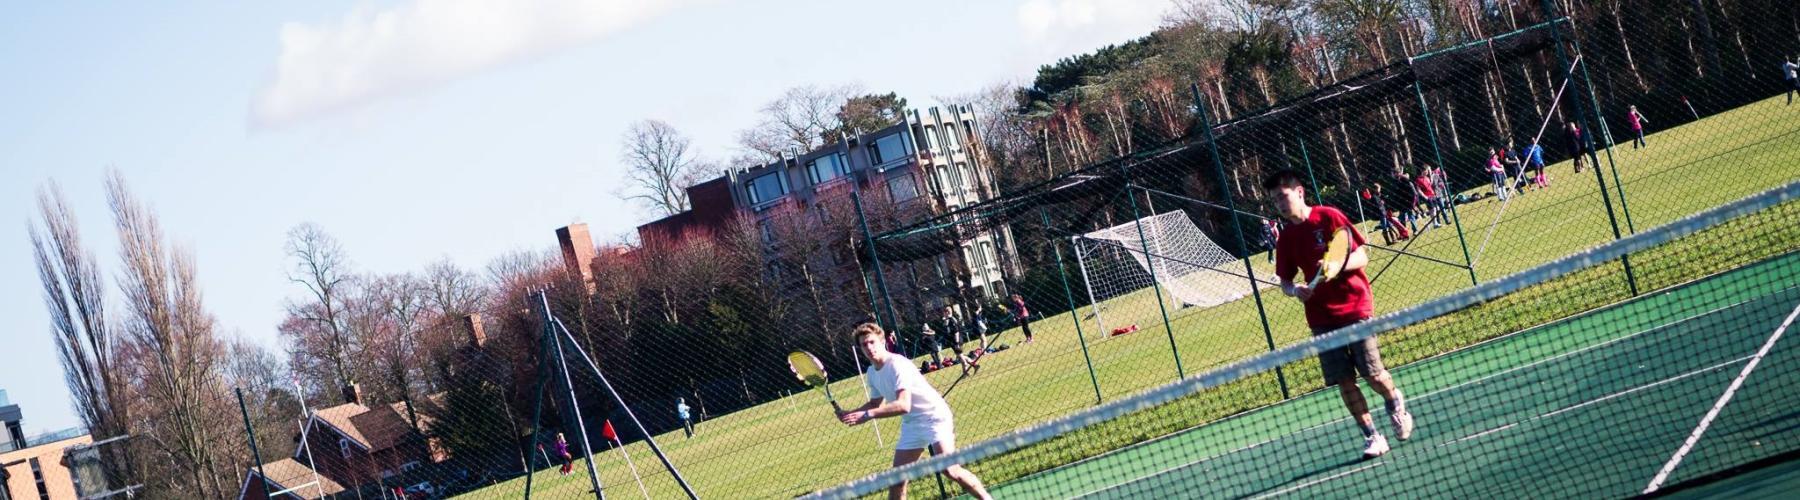 Corpus Christi tennis courts near Leckhampton